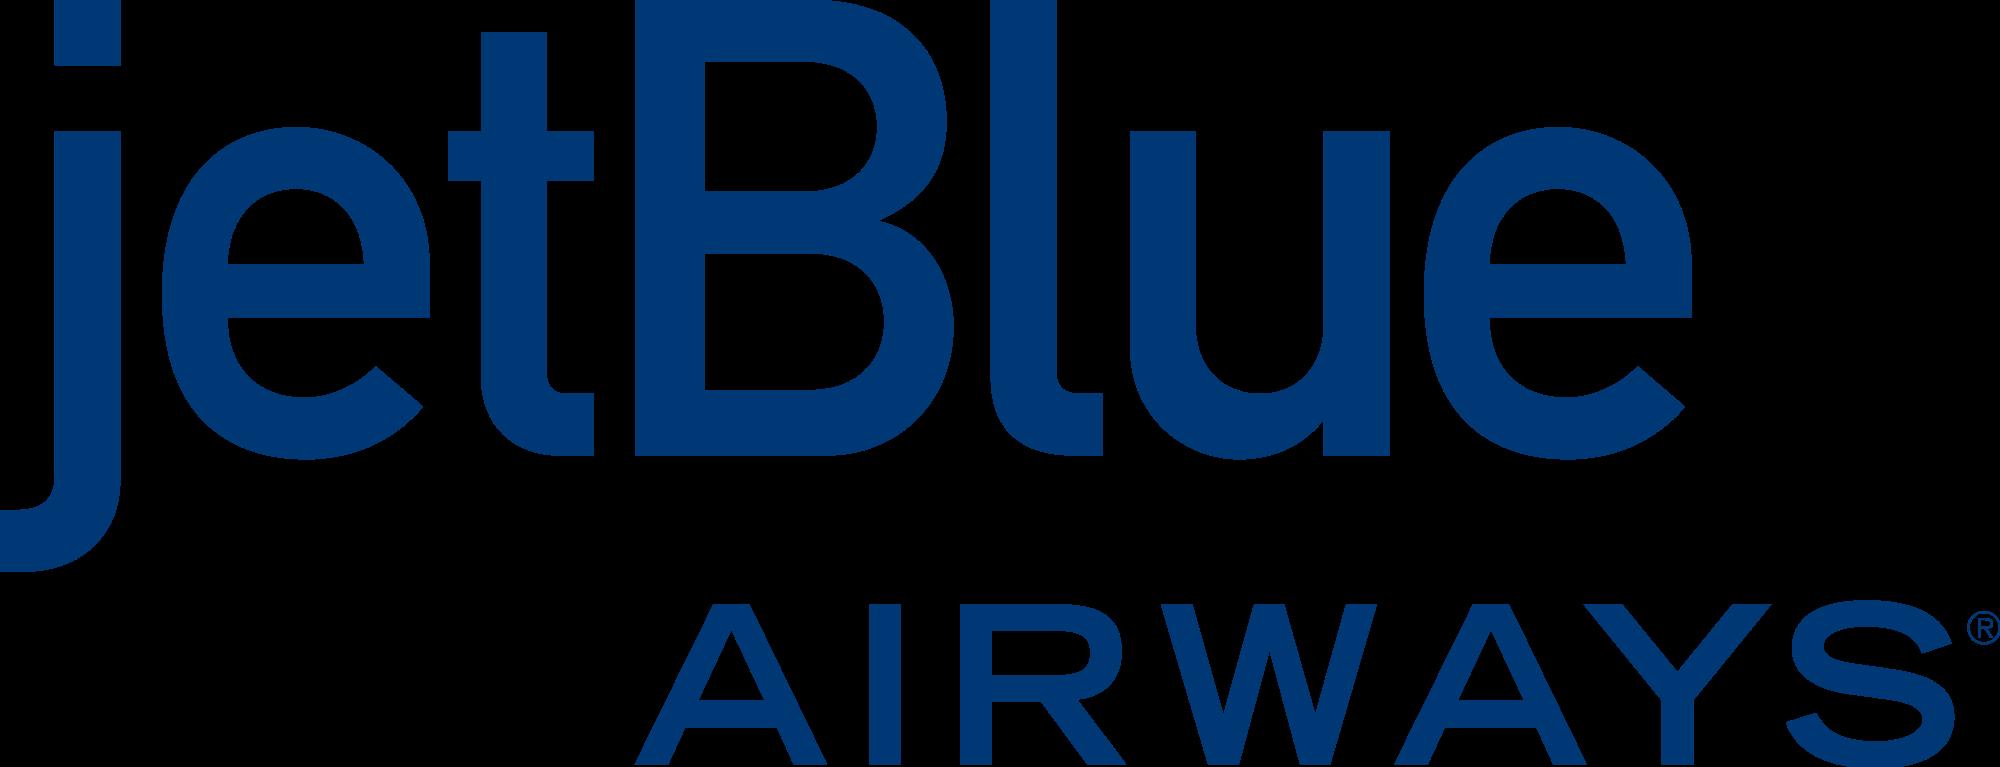 Jet blue jet